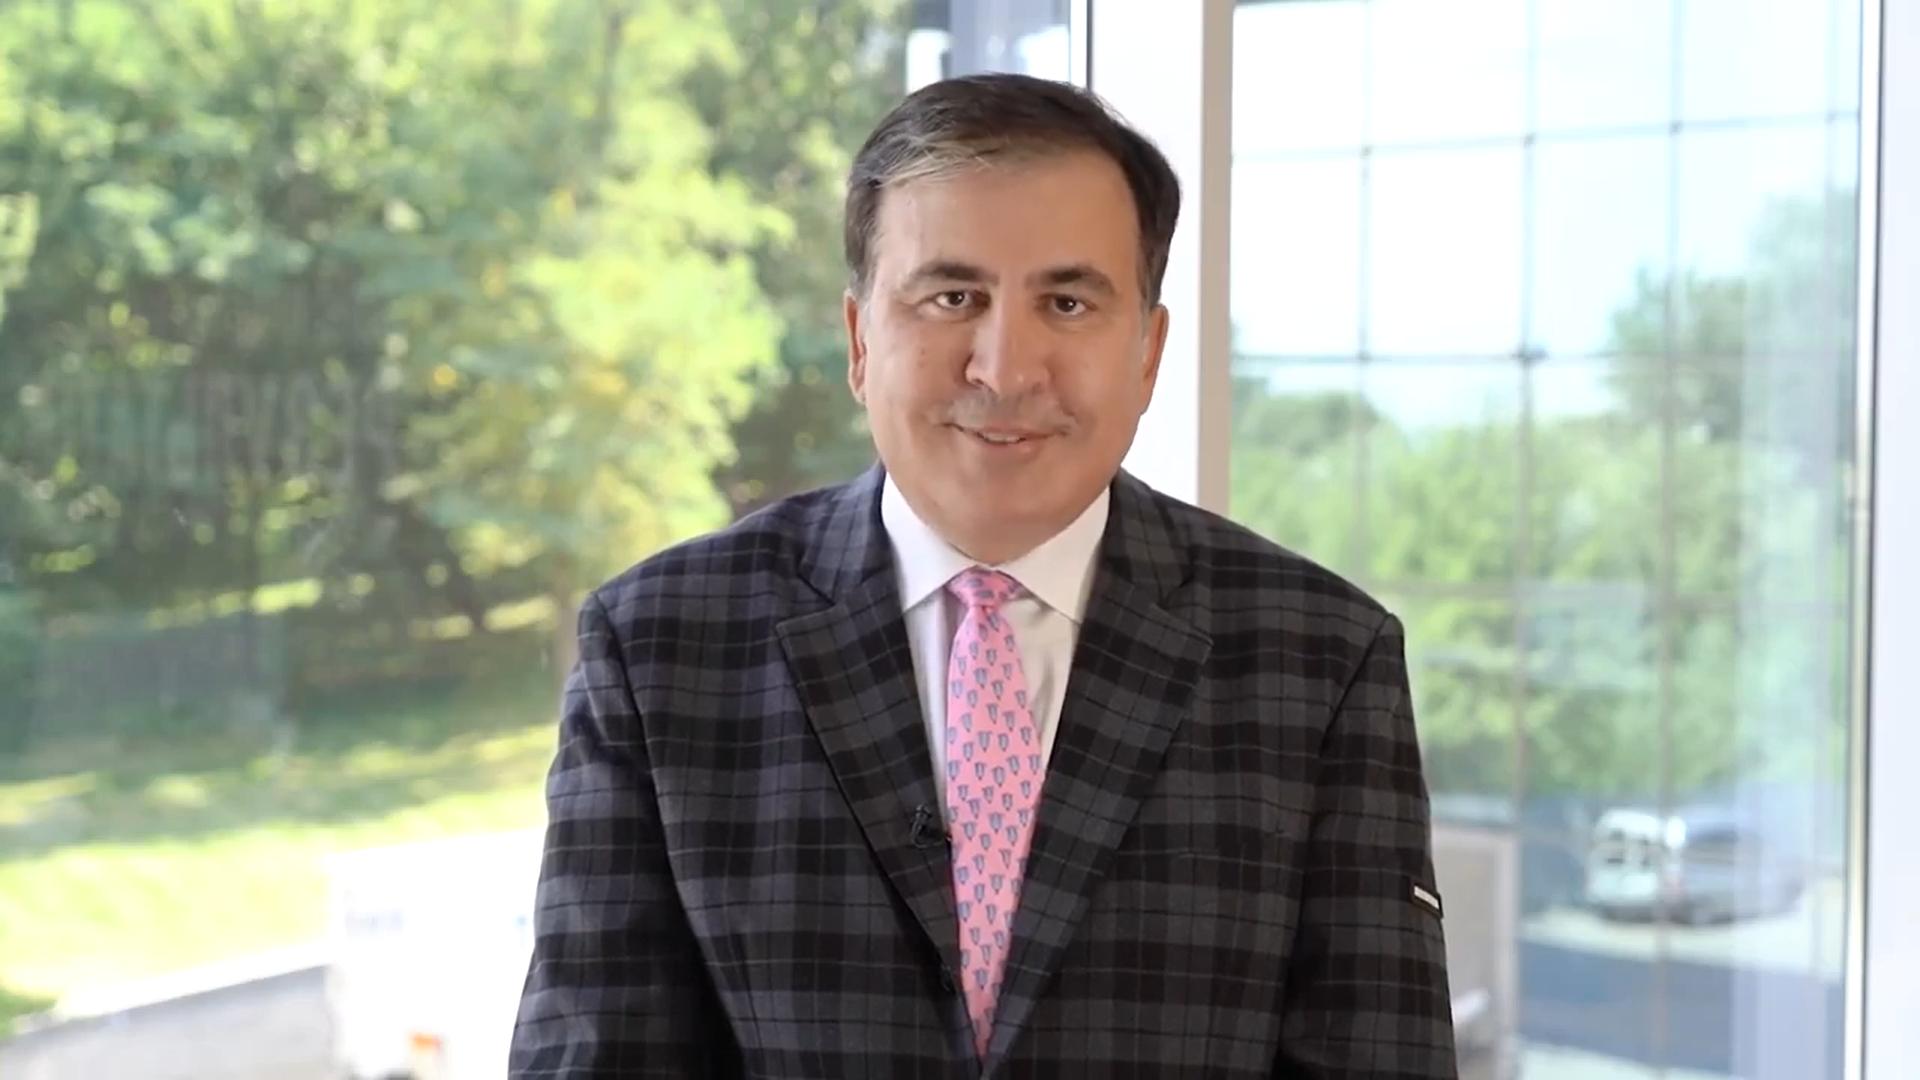 Mikheil Saakashvili 5325 #новости возвращение Саакашвили, Михаил Саакашвили, Шио Муджири